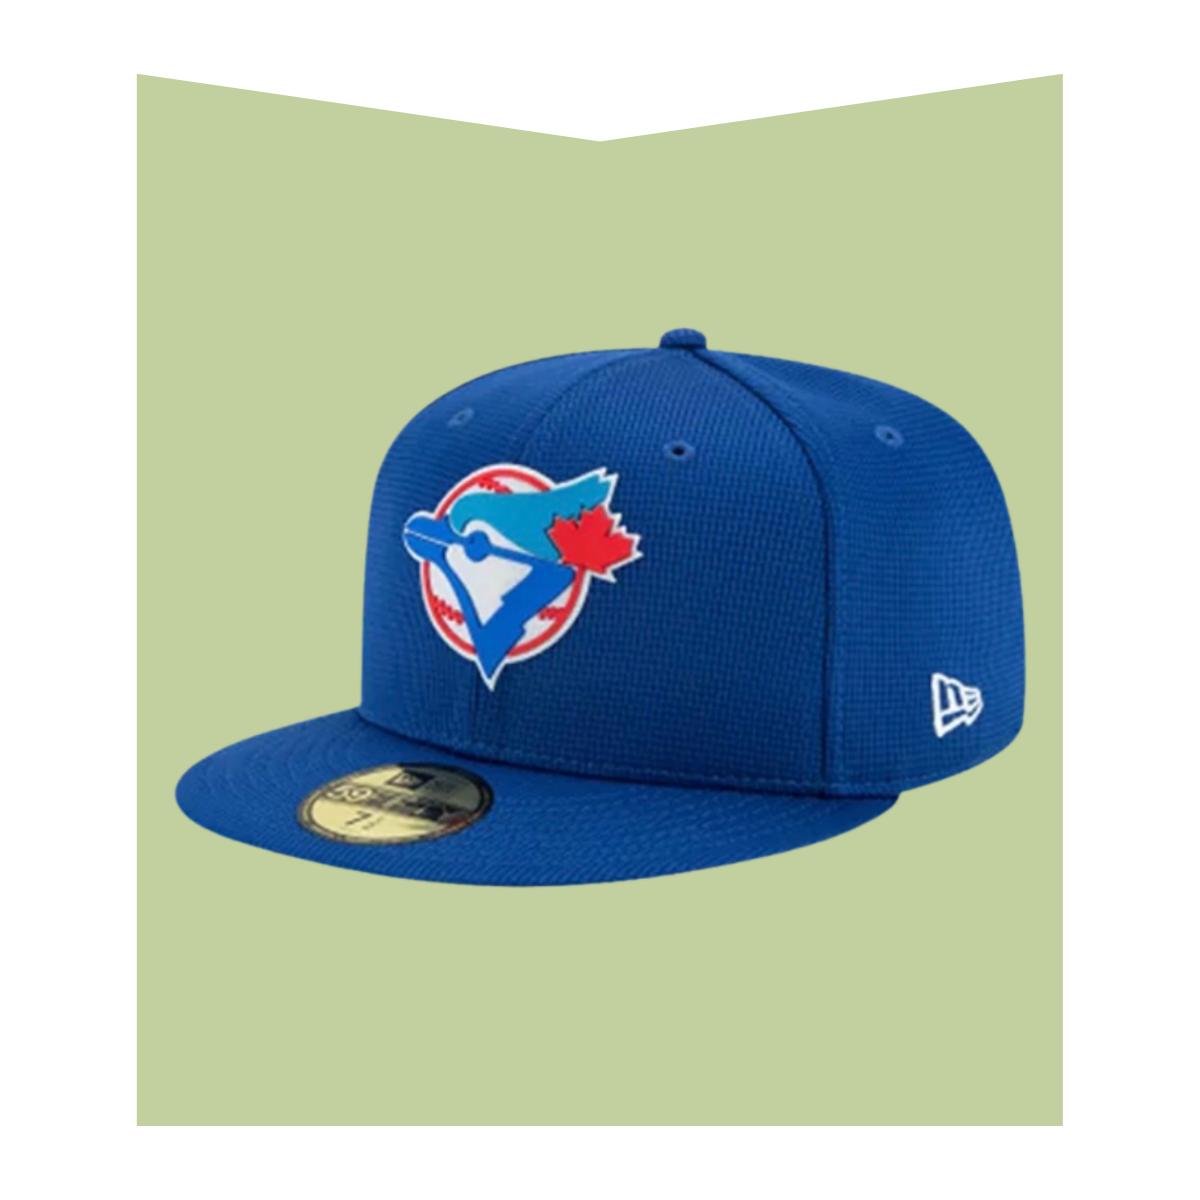 Blue Jays Hats from SportChek